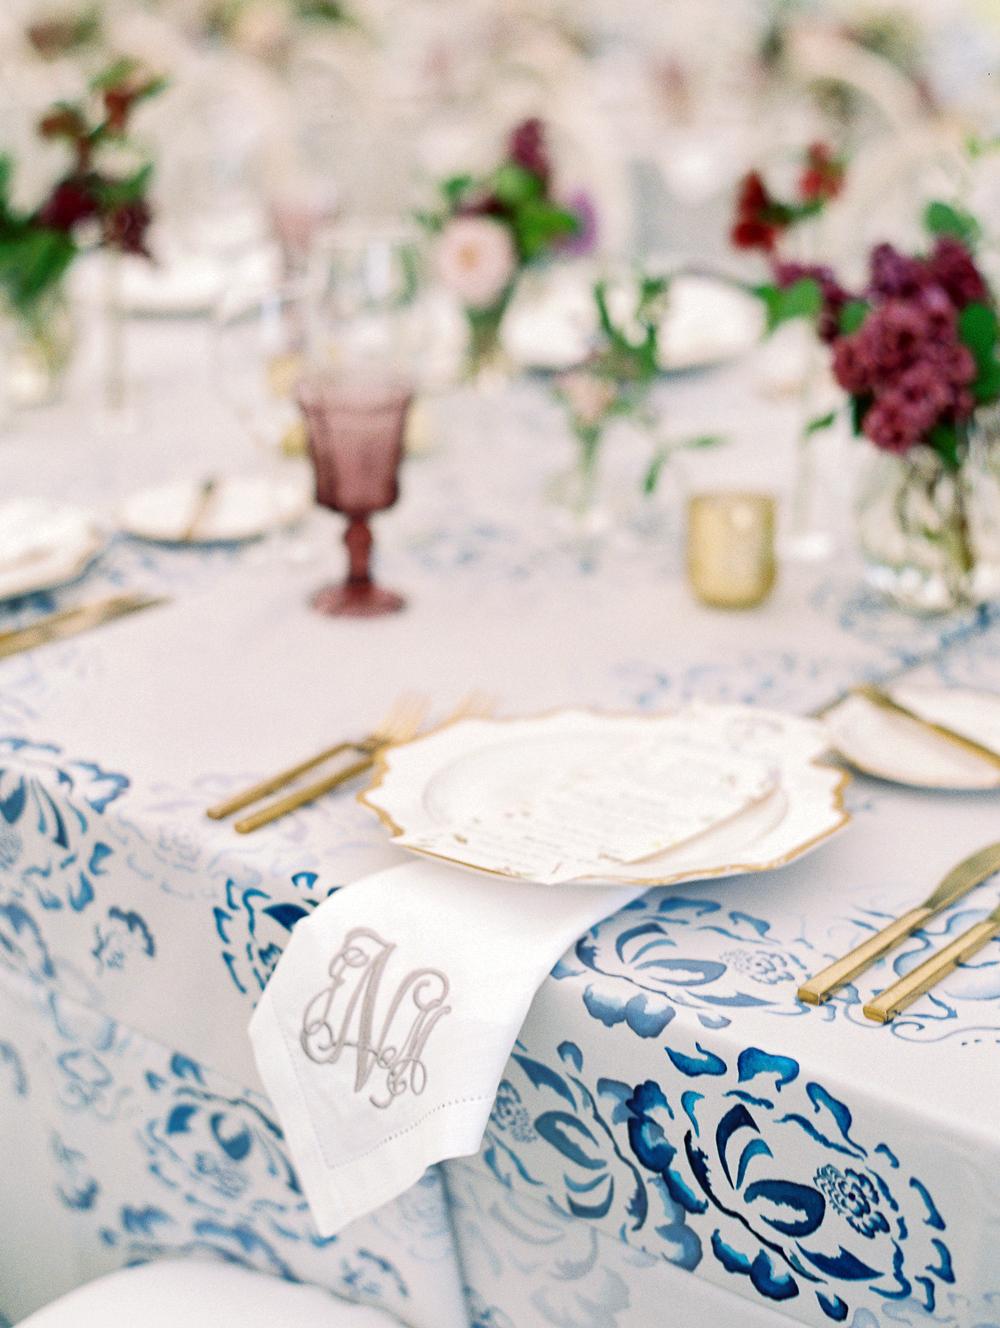 julia mitchell wedding place setting monogram